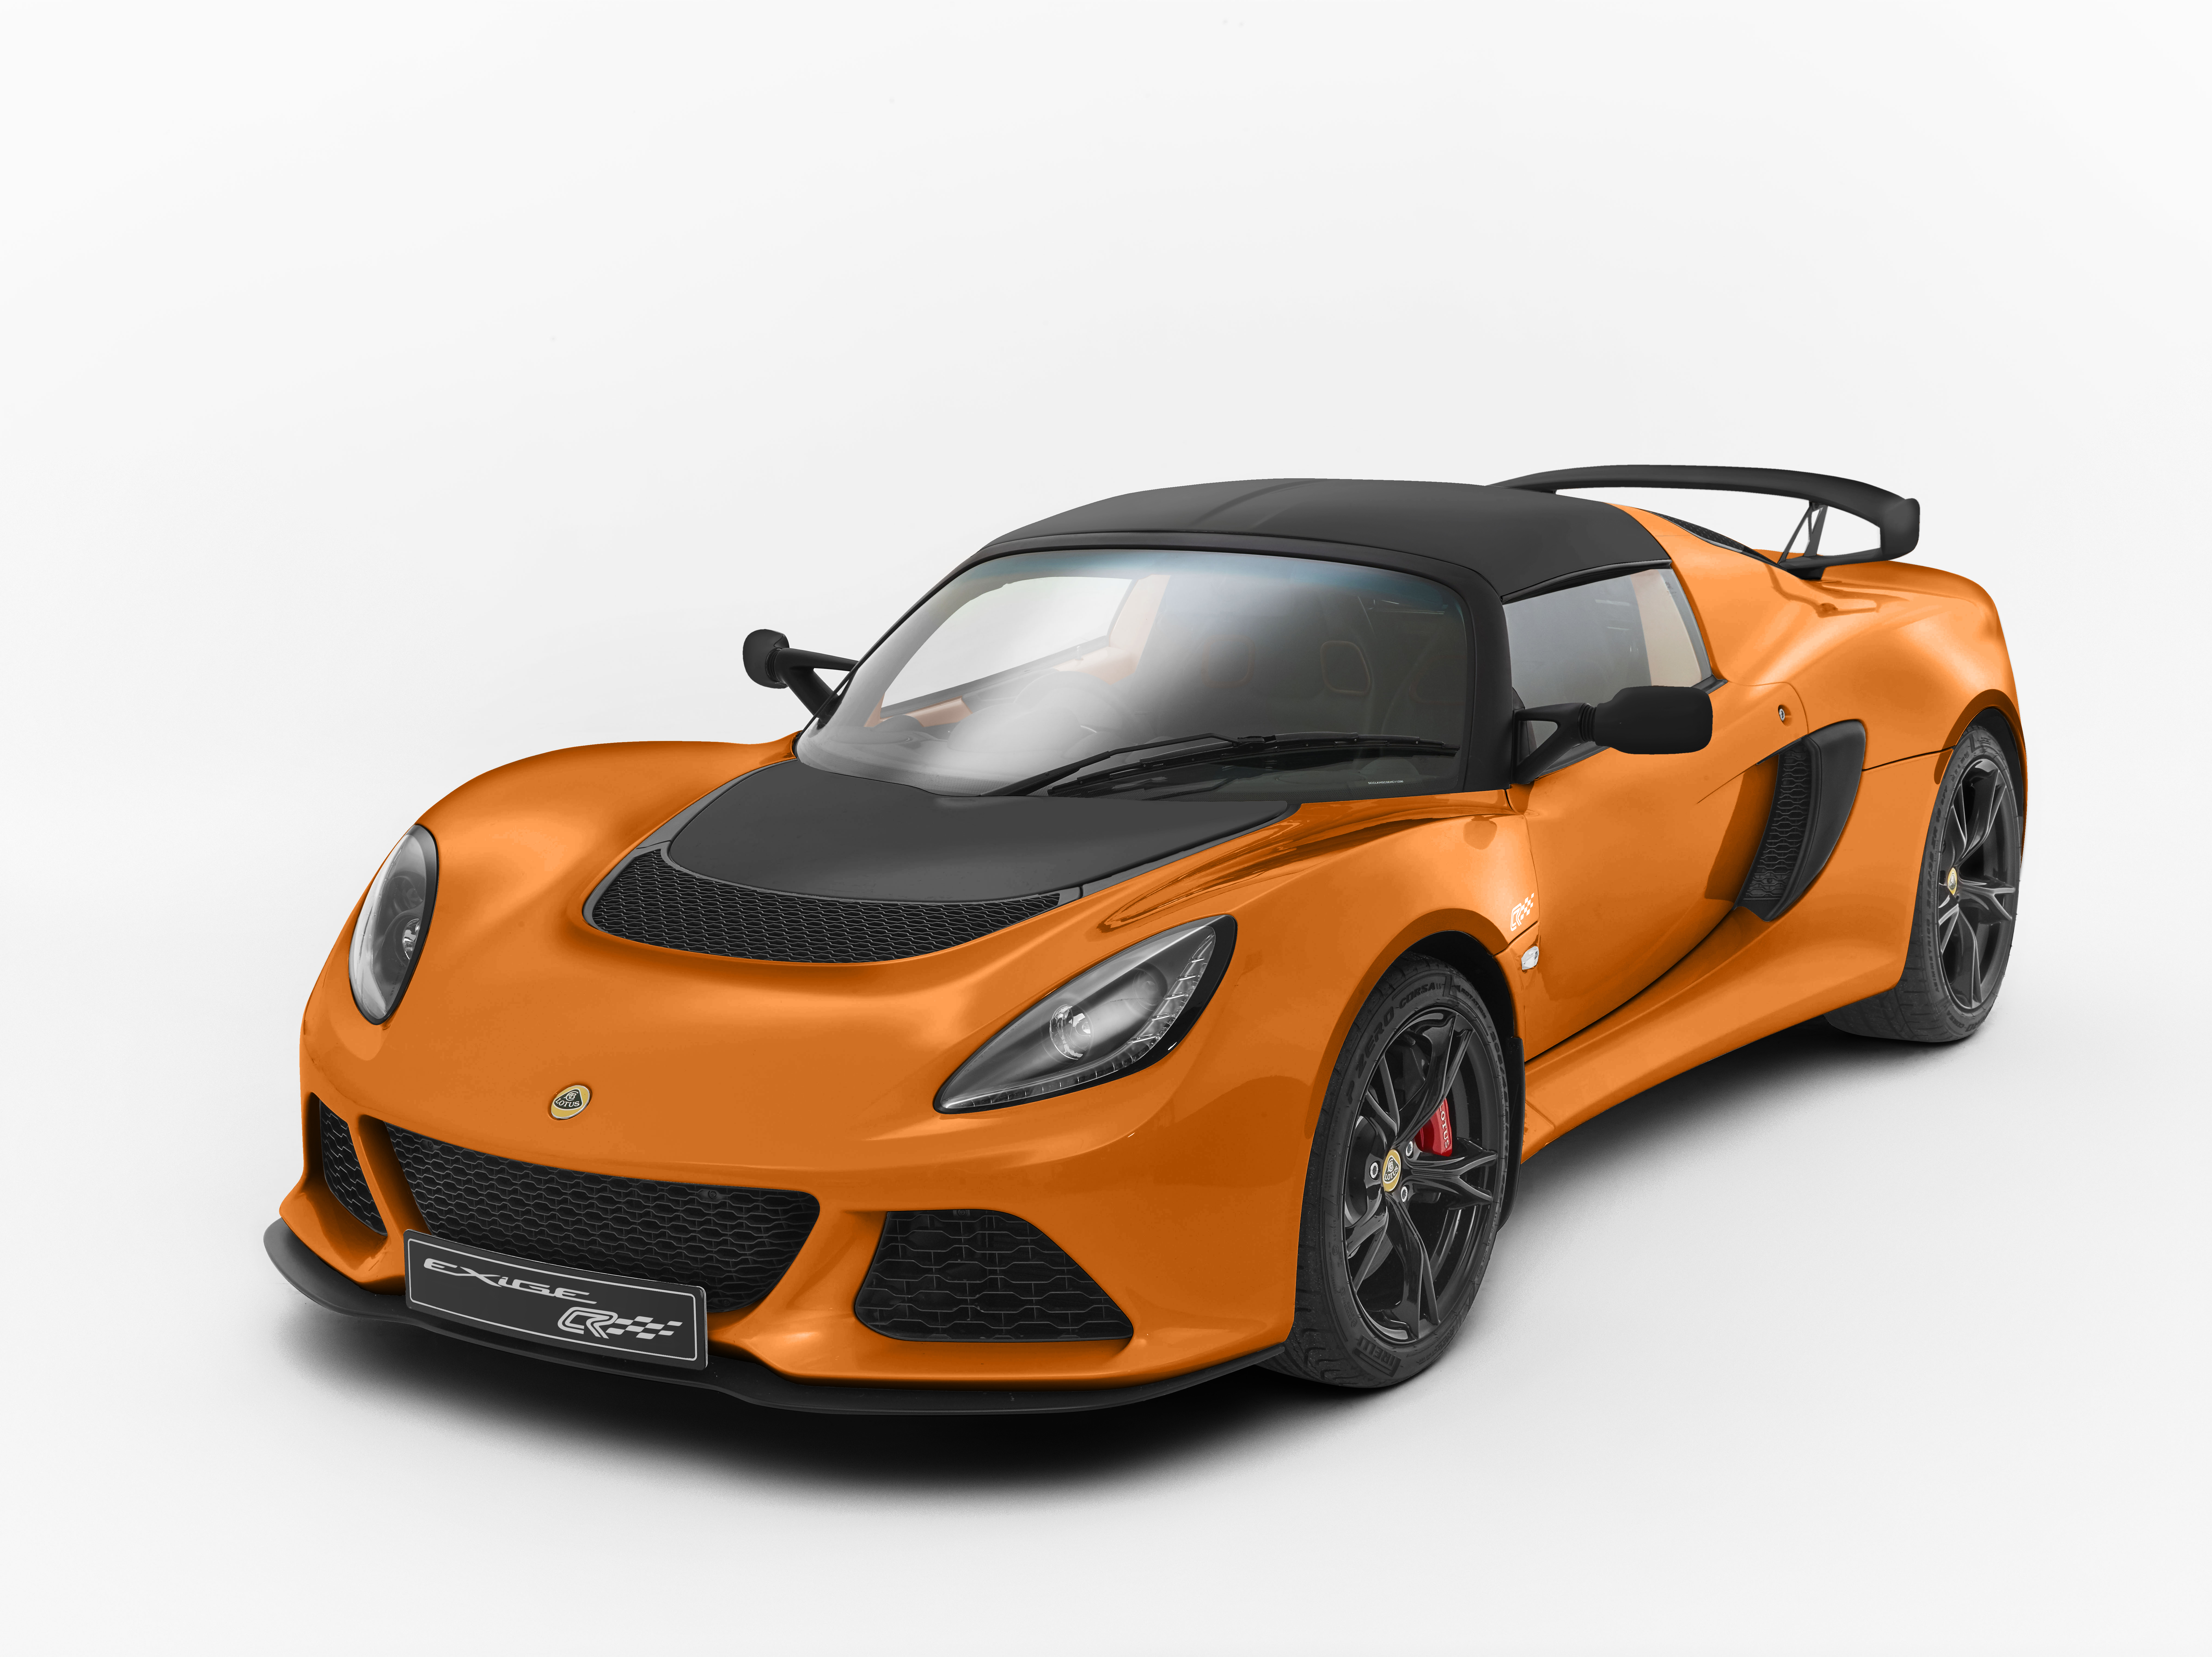 https://rmsmotoring.com/wp/wp-content/uploads/2015/03/Lotus-Exige-S-Club-Racer.jpg